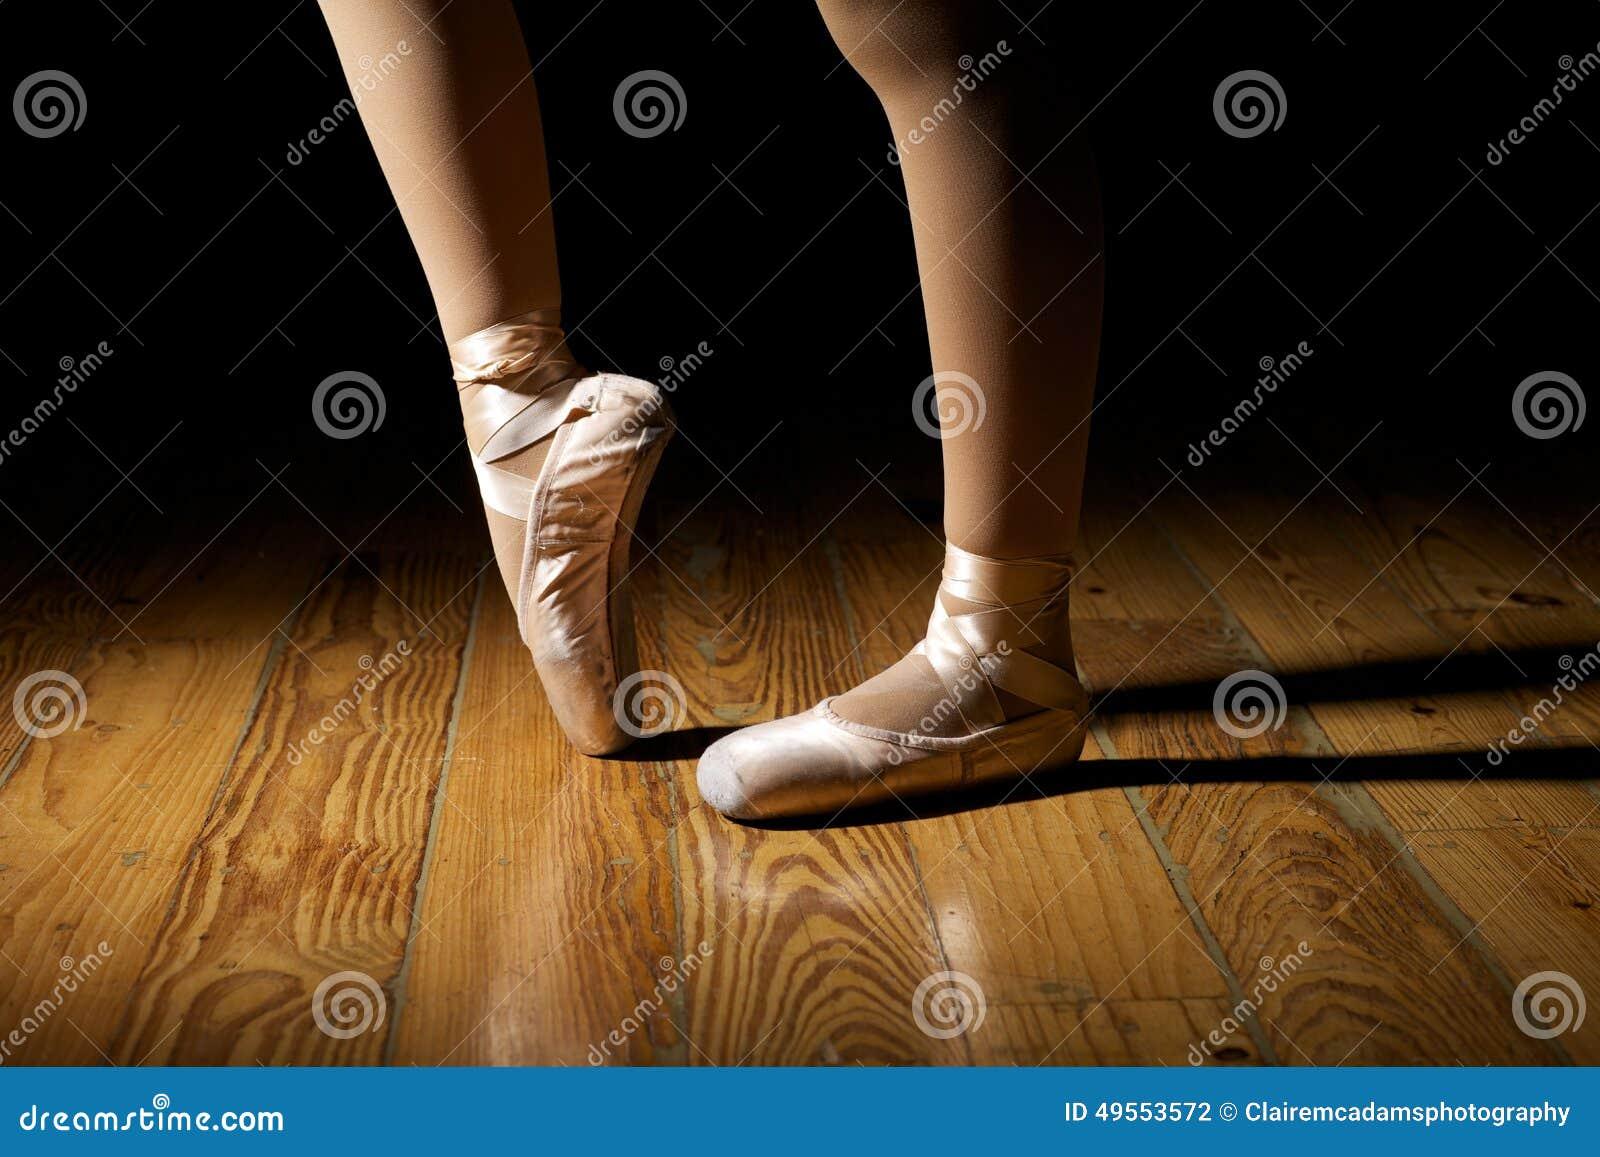 Closeup of Ballerina Feet